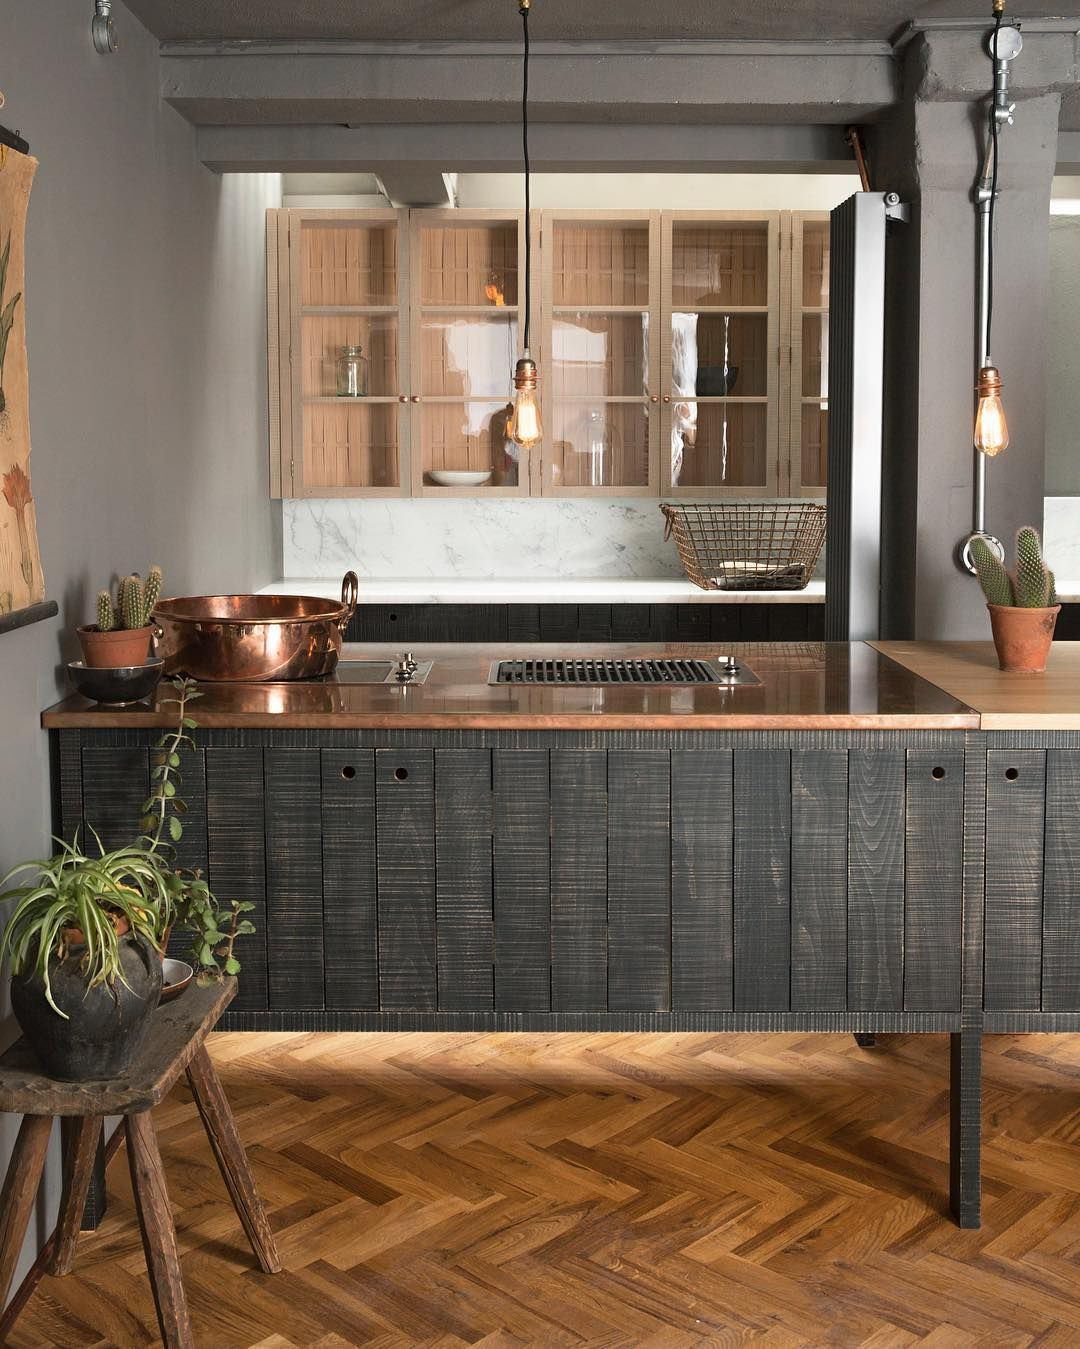 Gorgeousdevol Kitchens See This Instagram Photo Stunning Kitchen Unit Designs Review